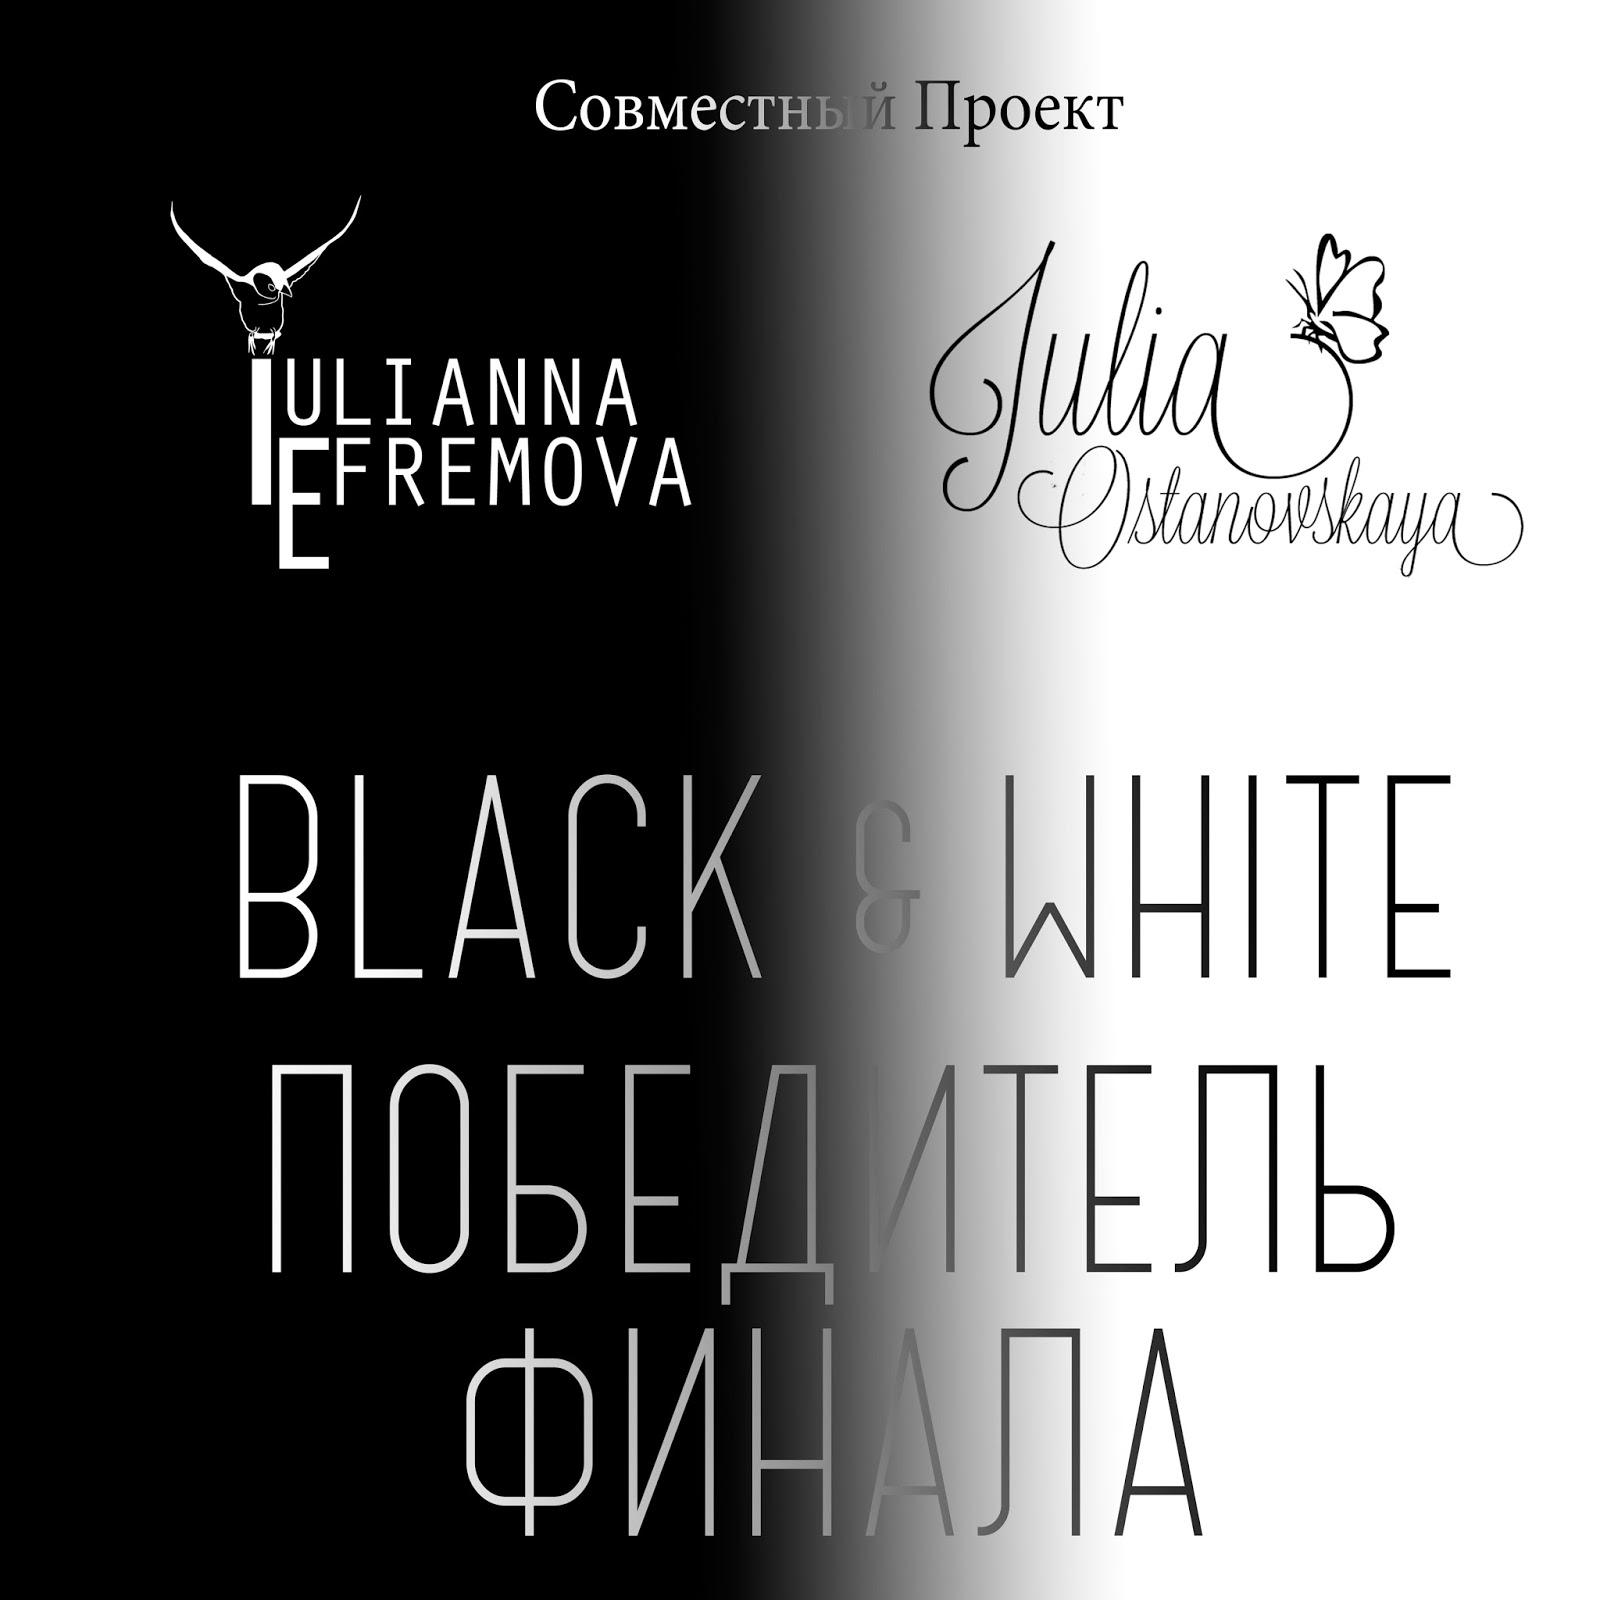 Я победитель финала СП Black&White